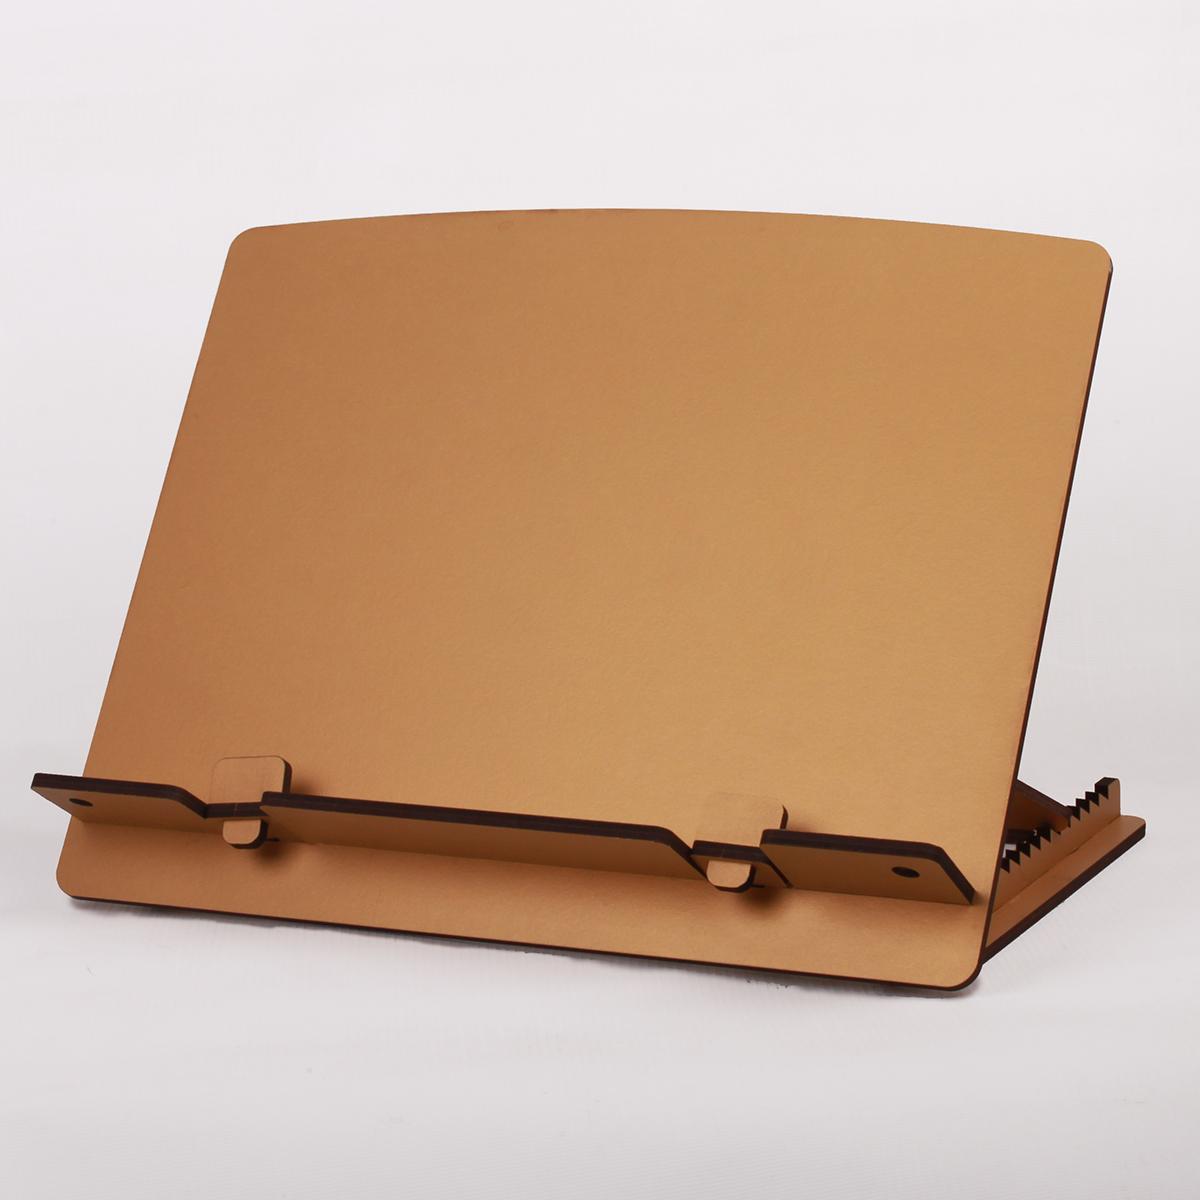 نگهدارنده کتاب مدل پاراکو کد 001